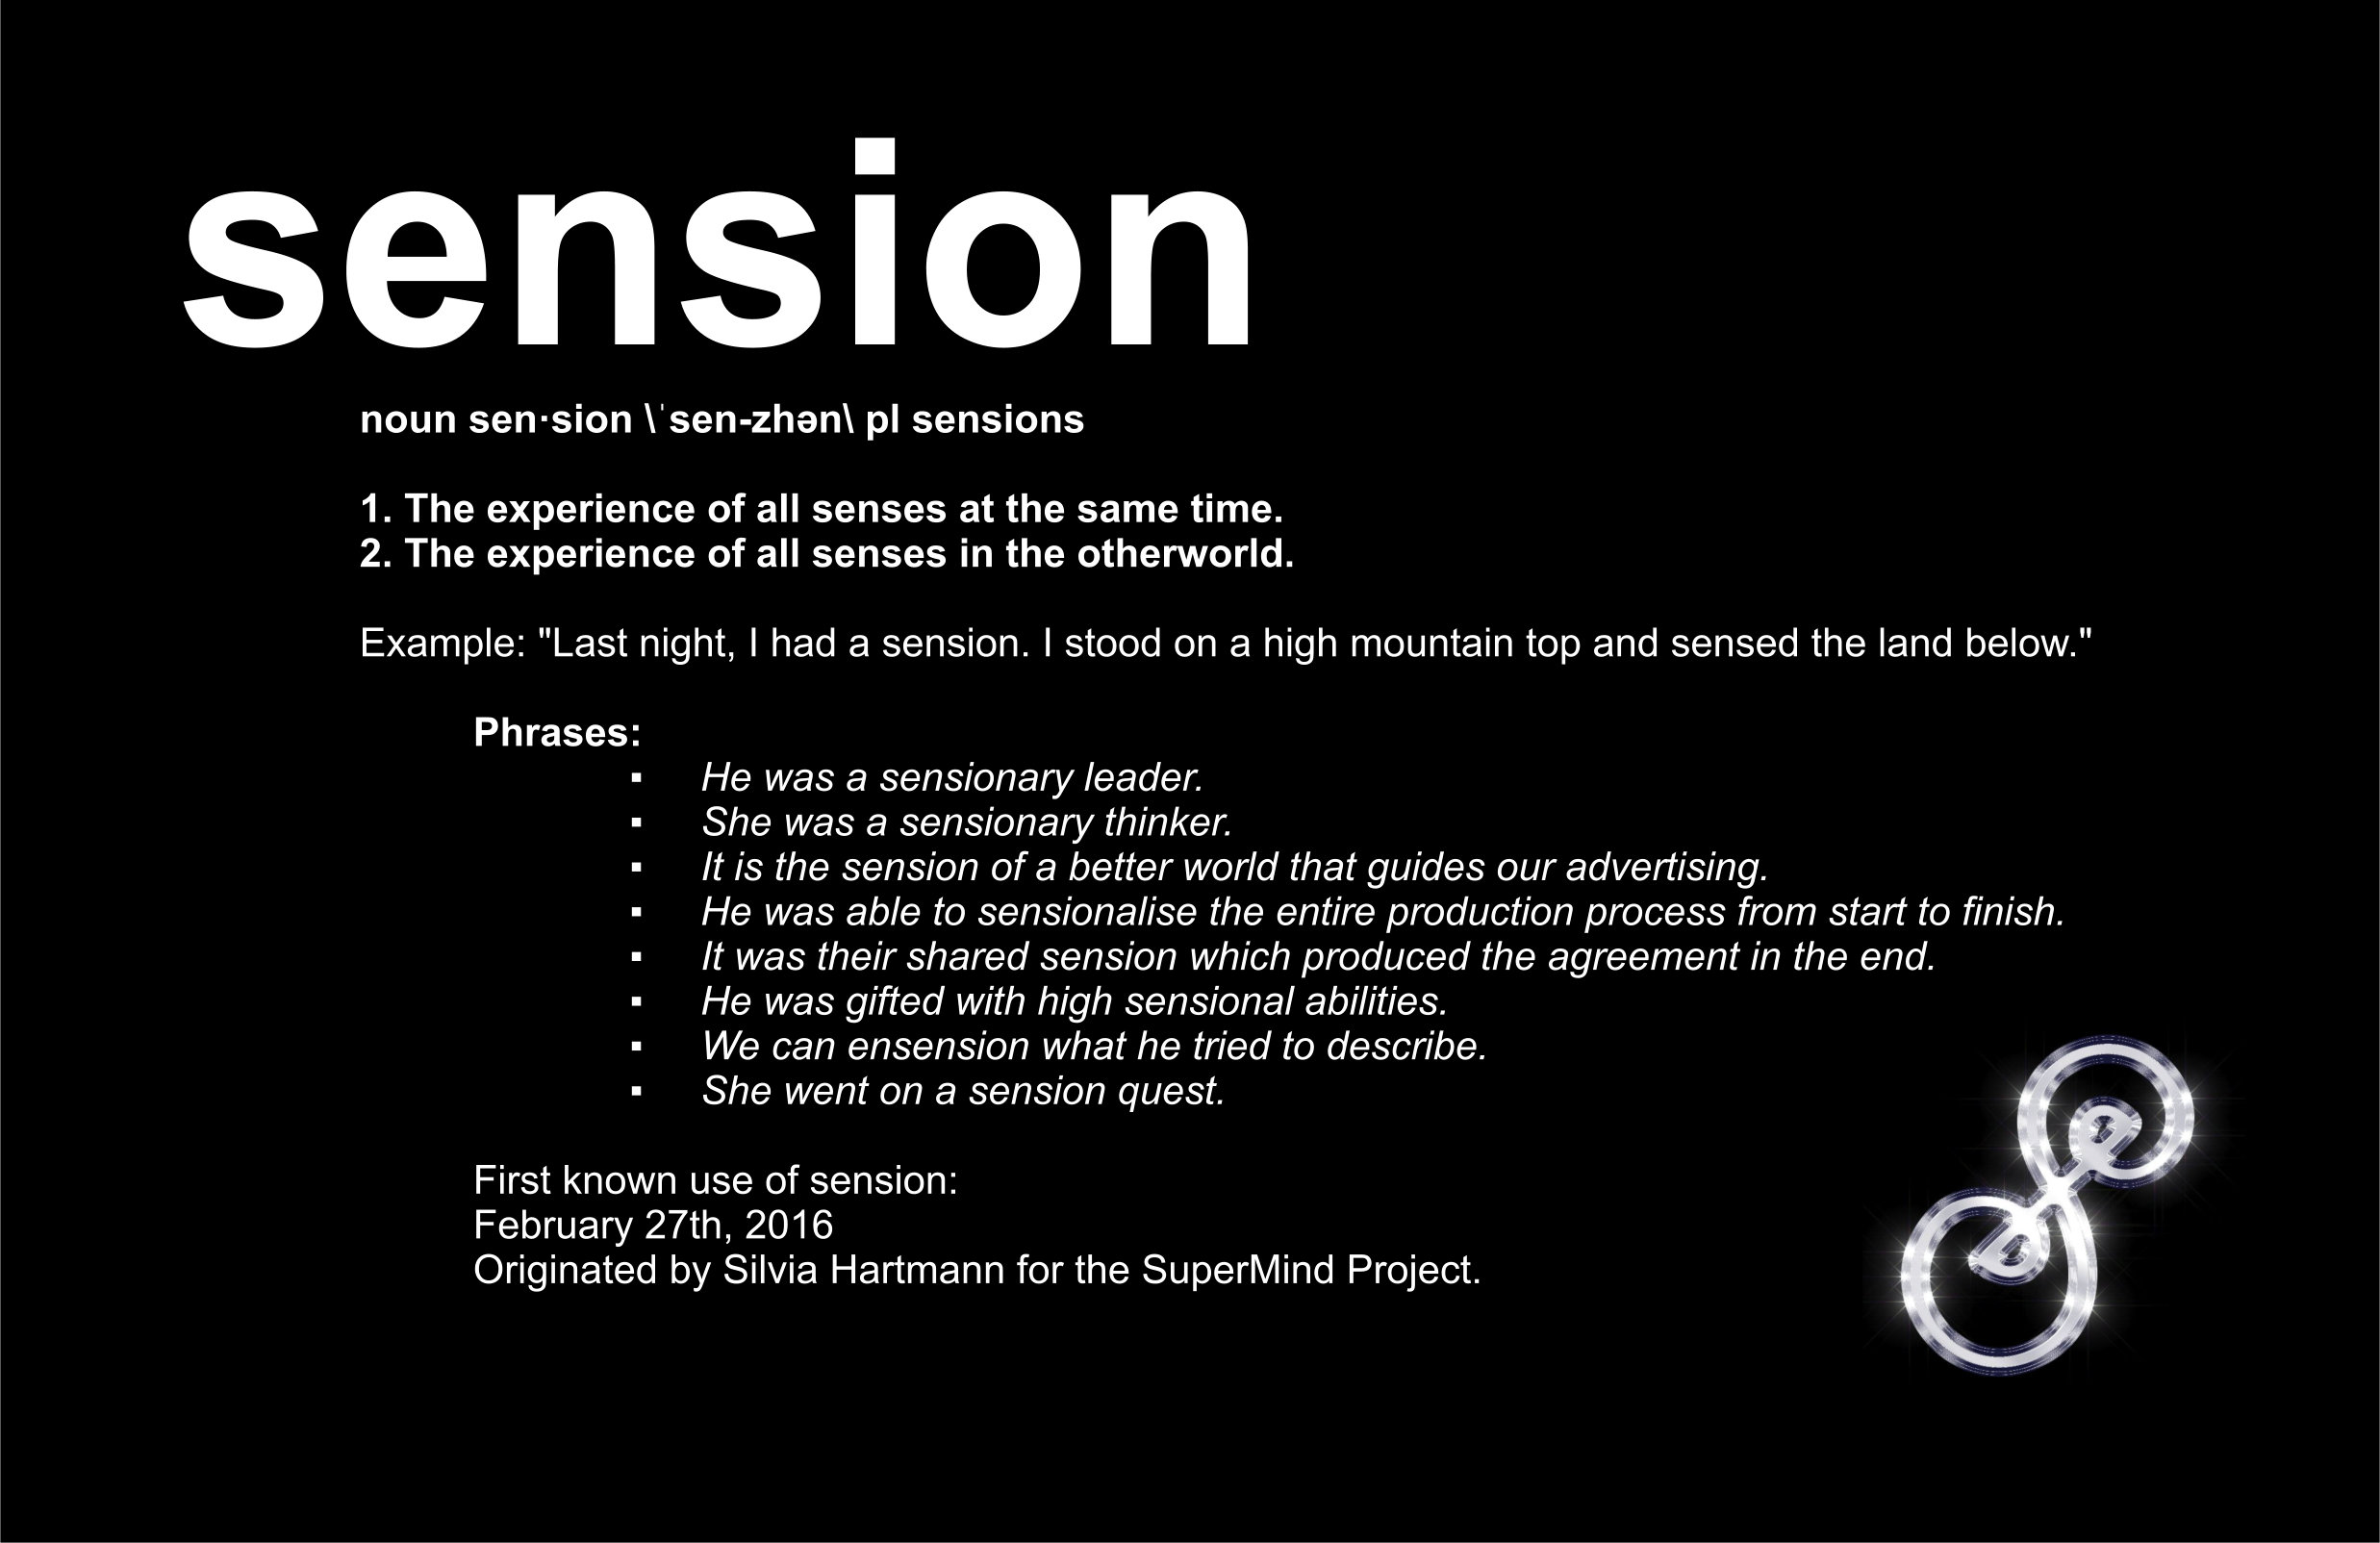 Sensions Produce Sensational Sensations!